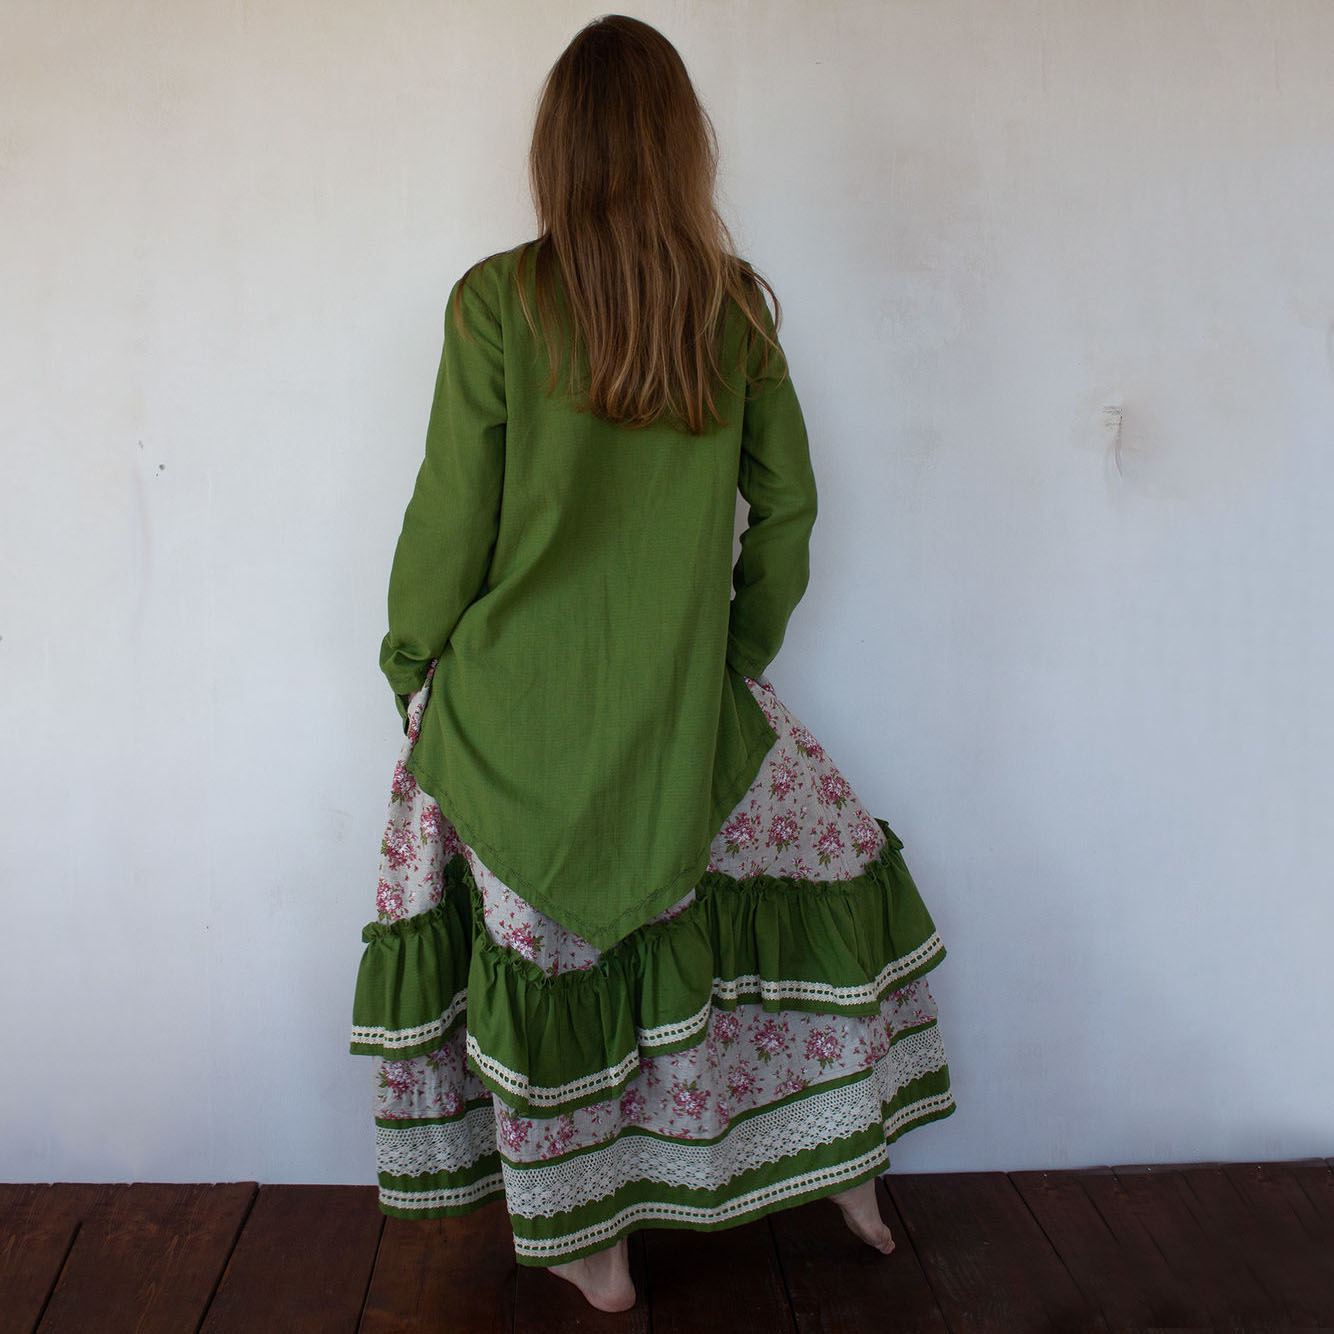 MarlЁn комплект юбка и туника Русская красавица (1)